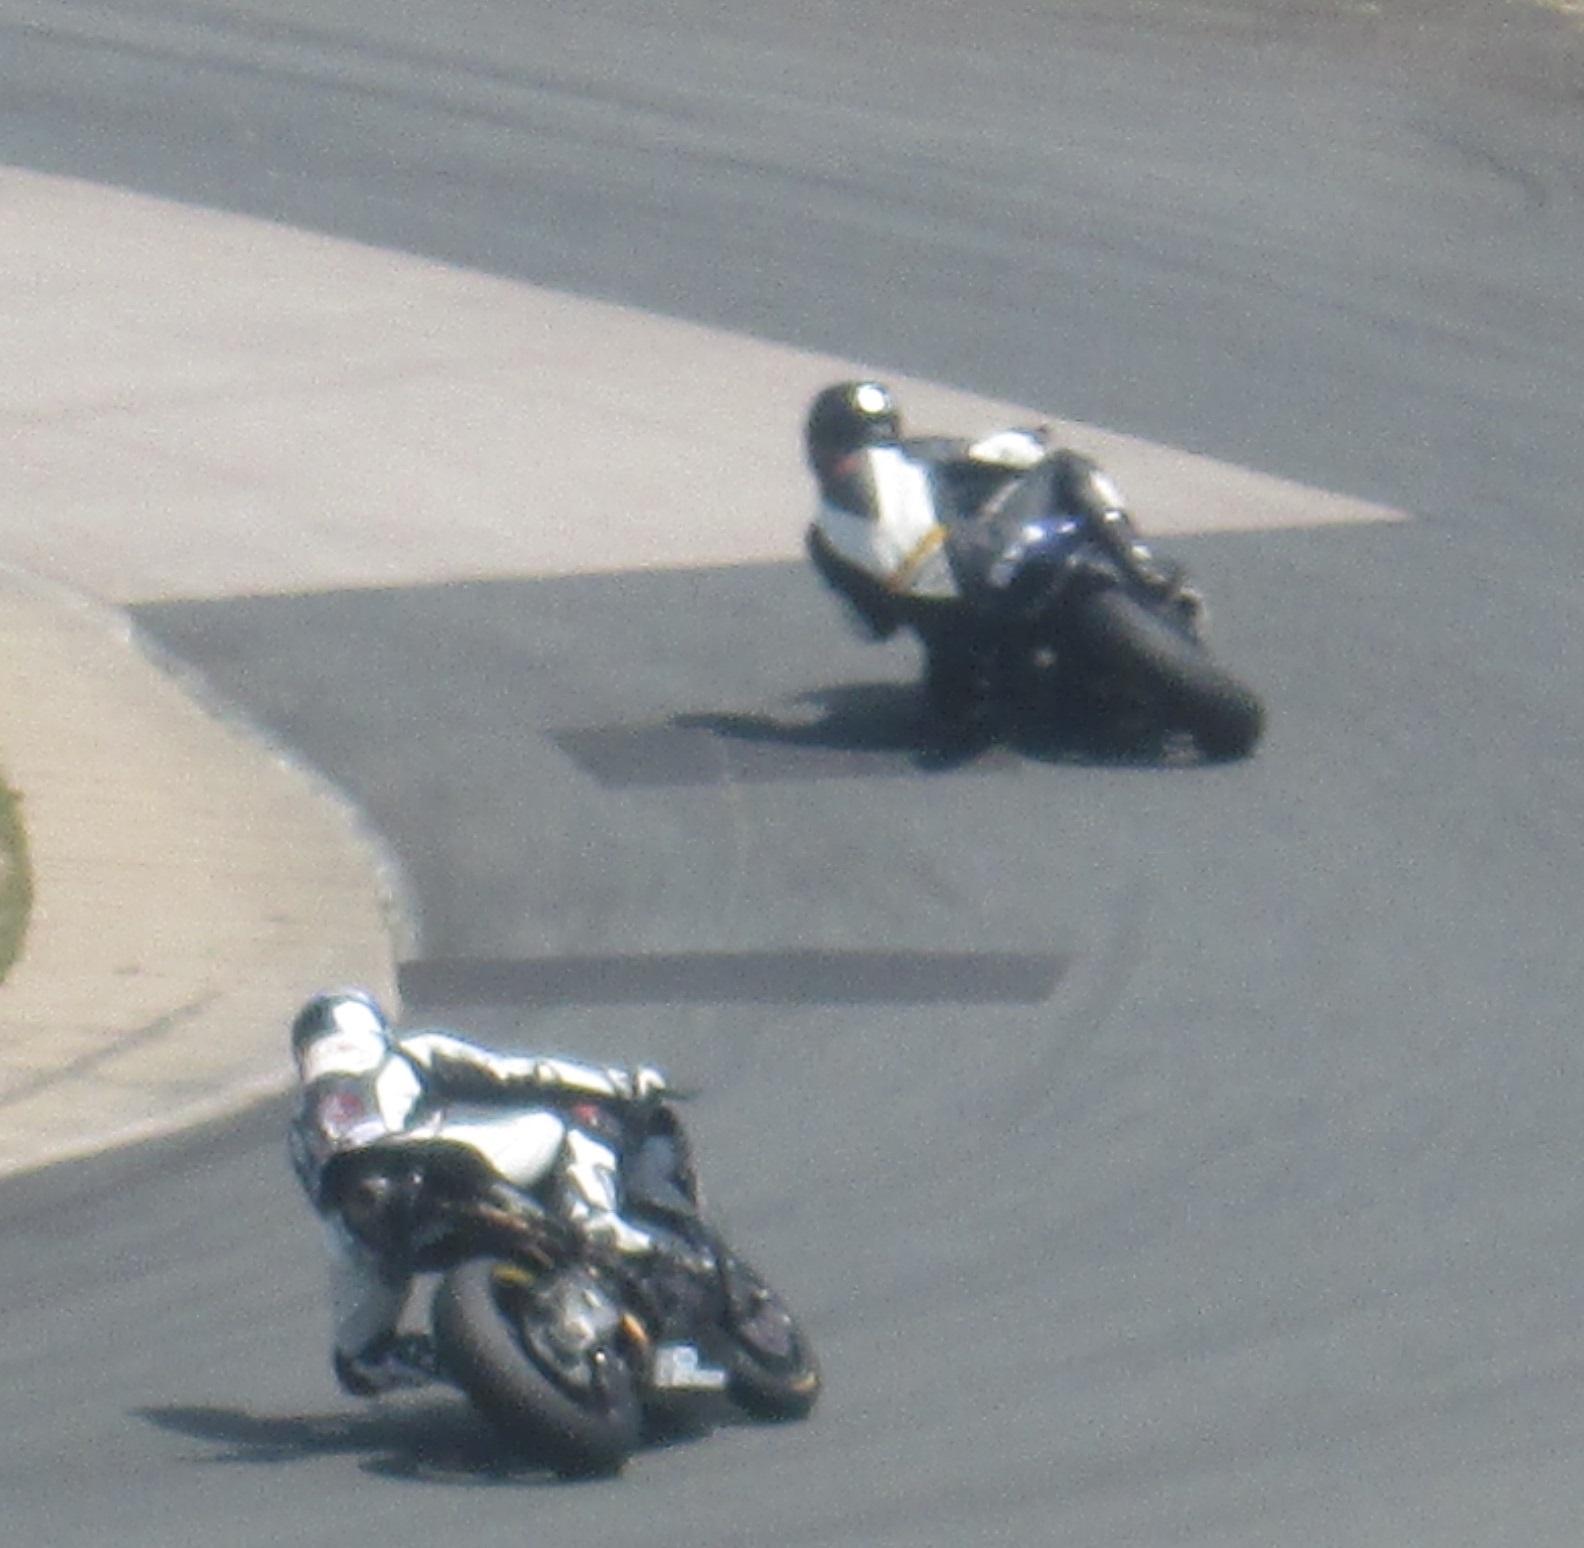 Superbikes 2014 picture number 25